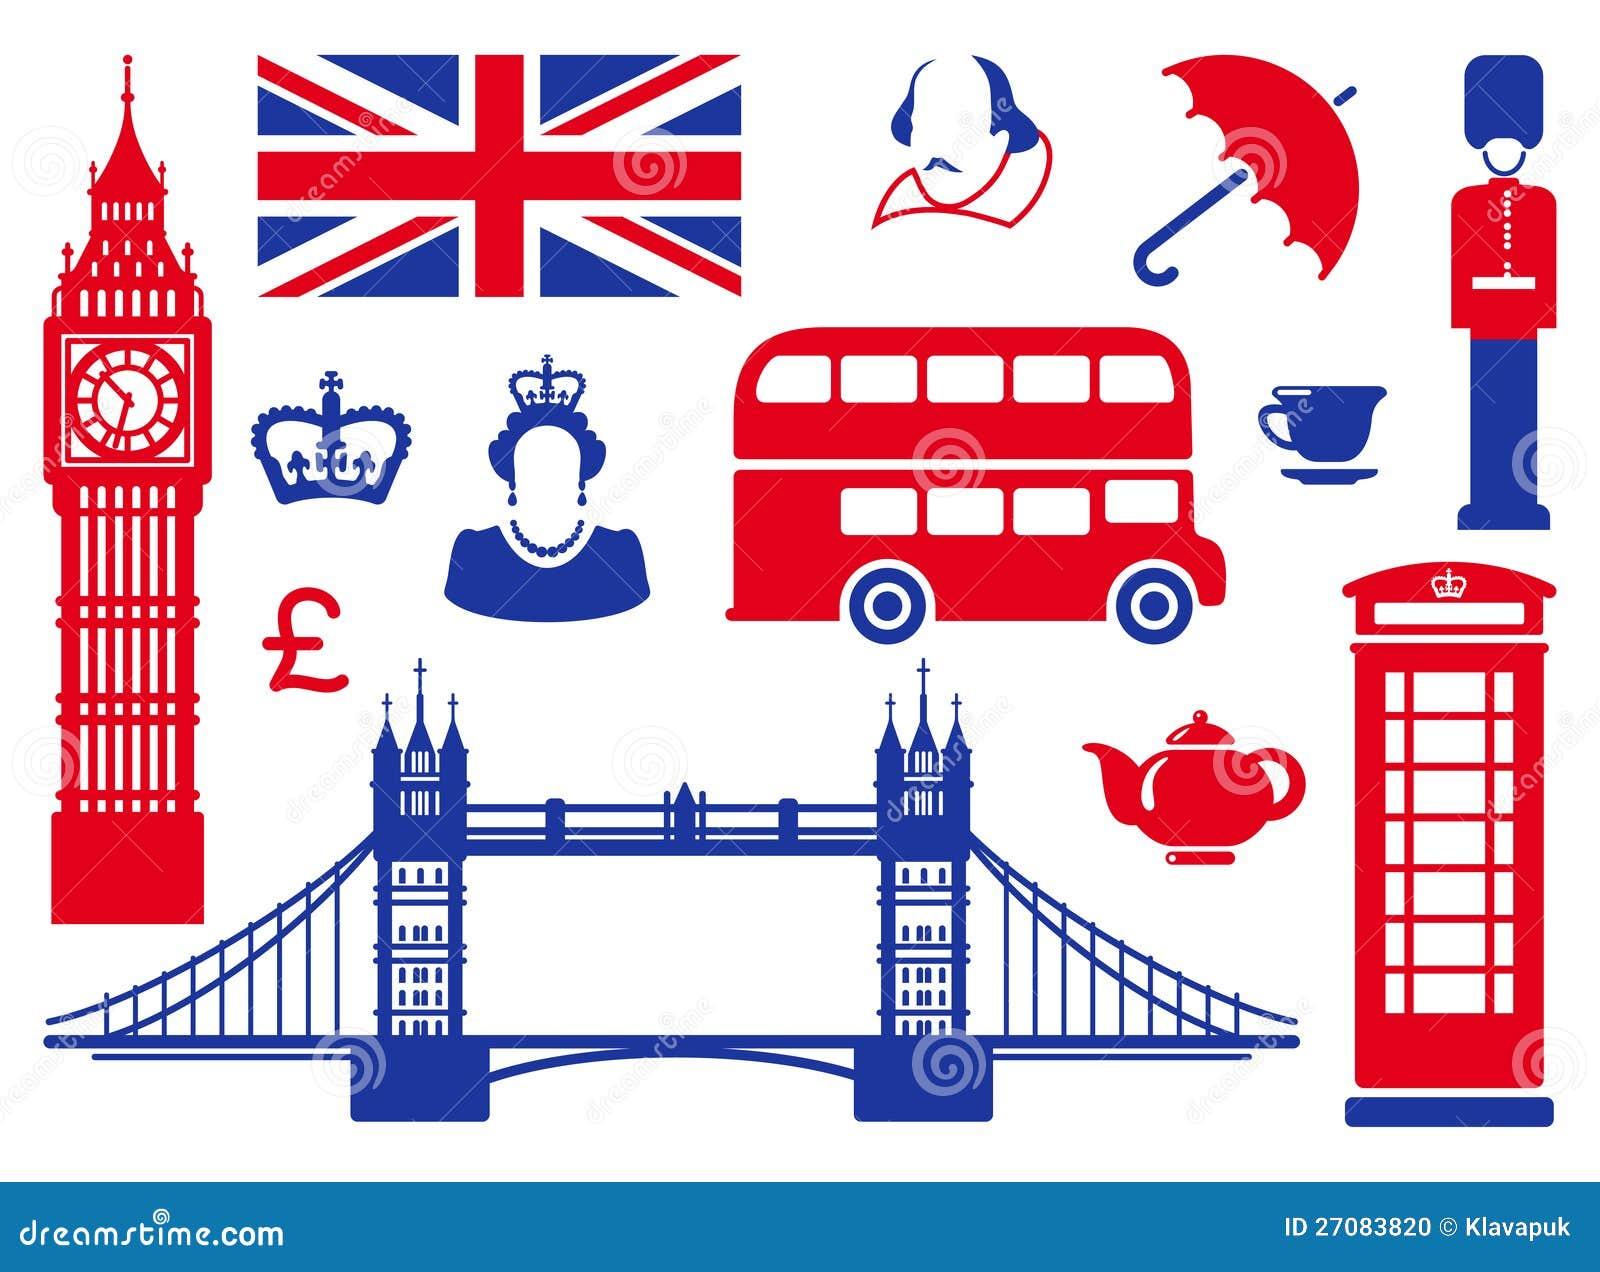 Iconos en un tema de Inglaterra